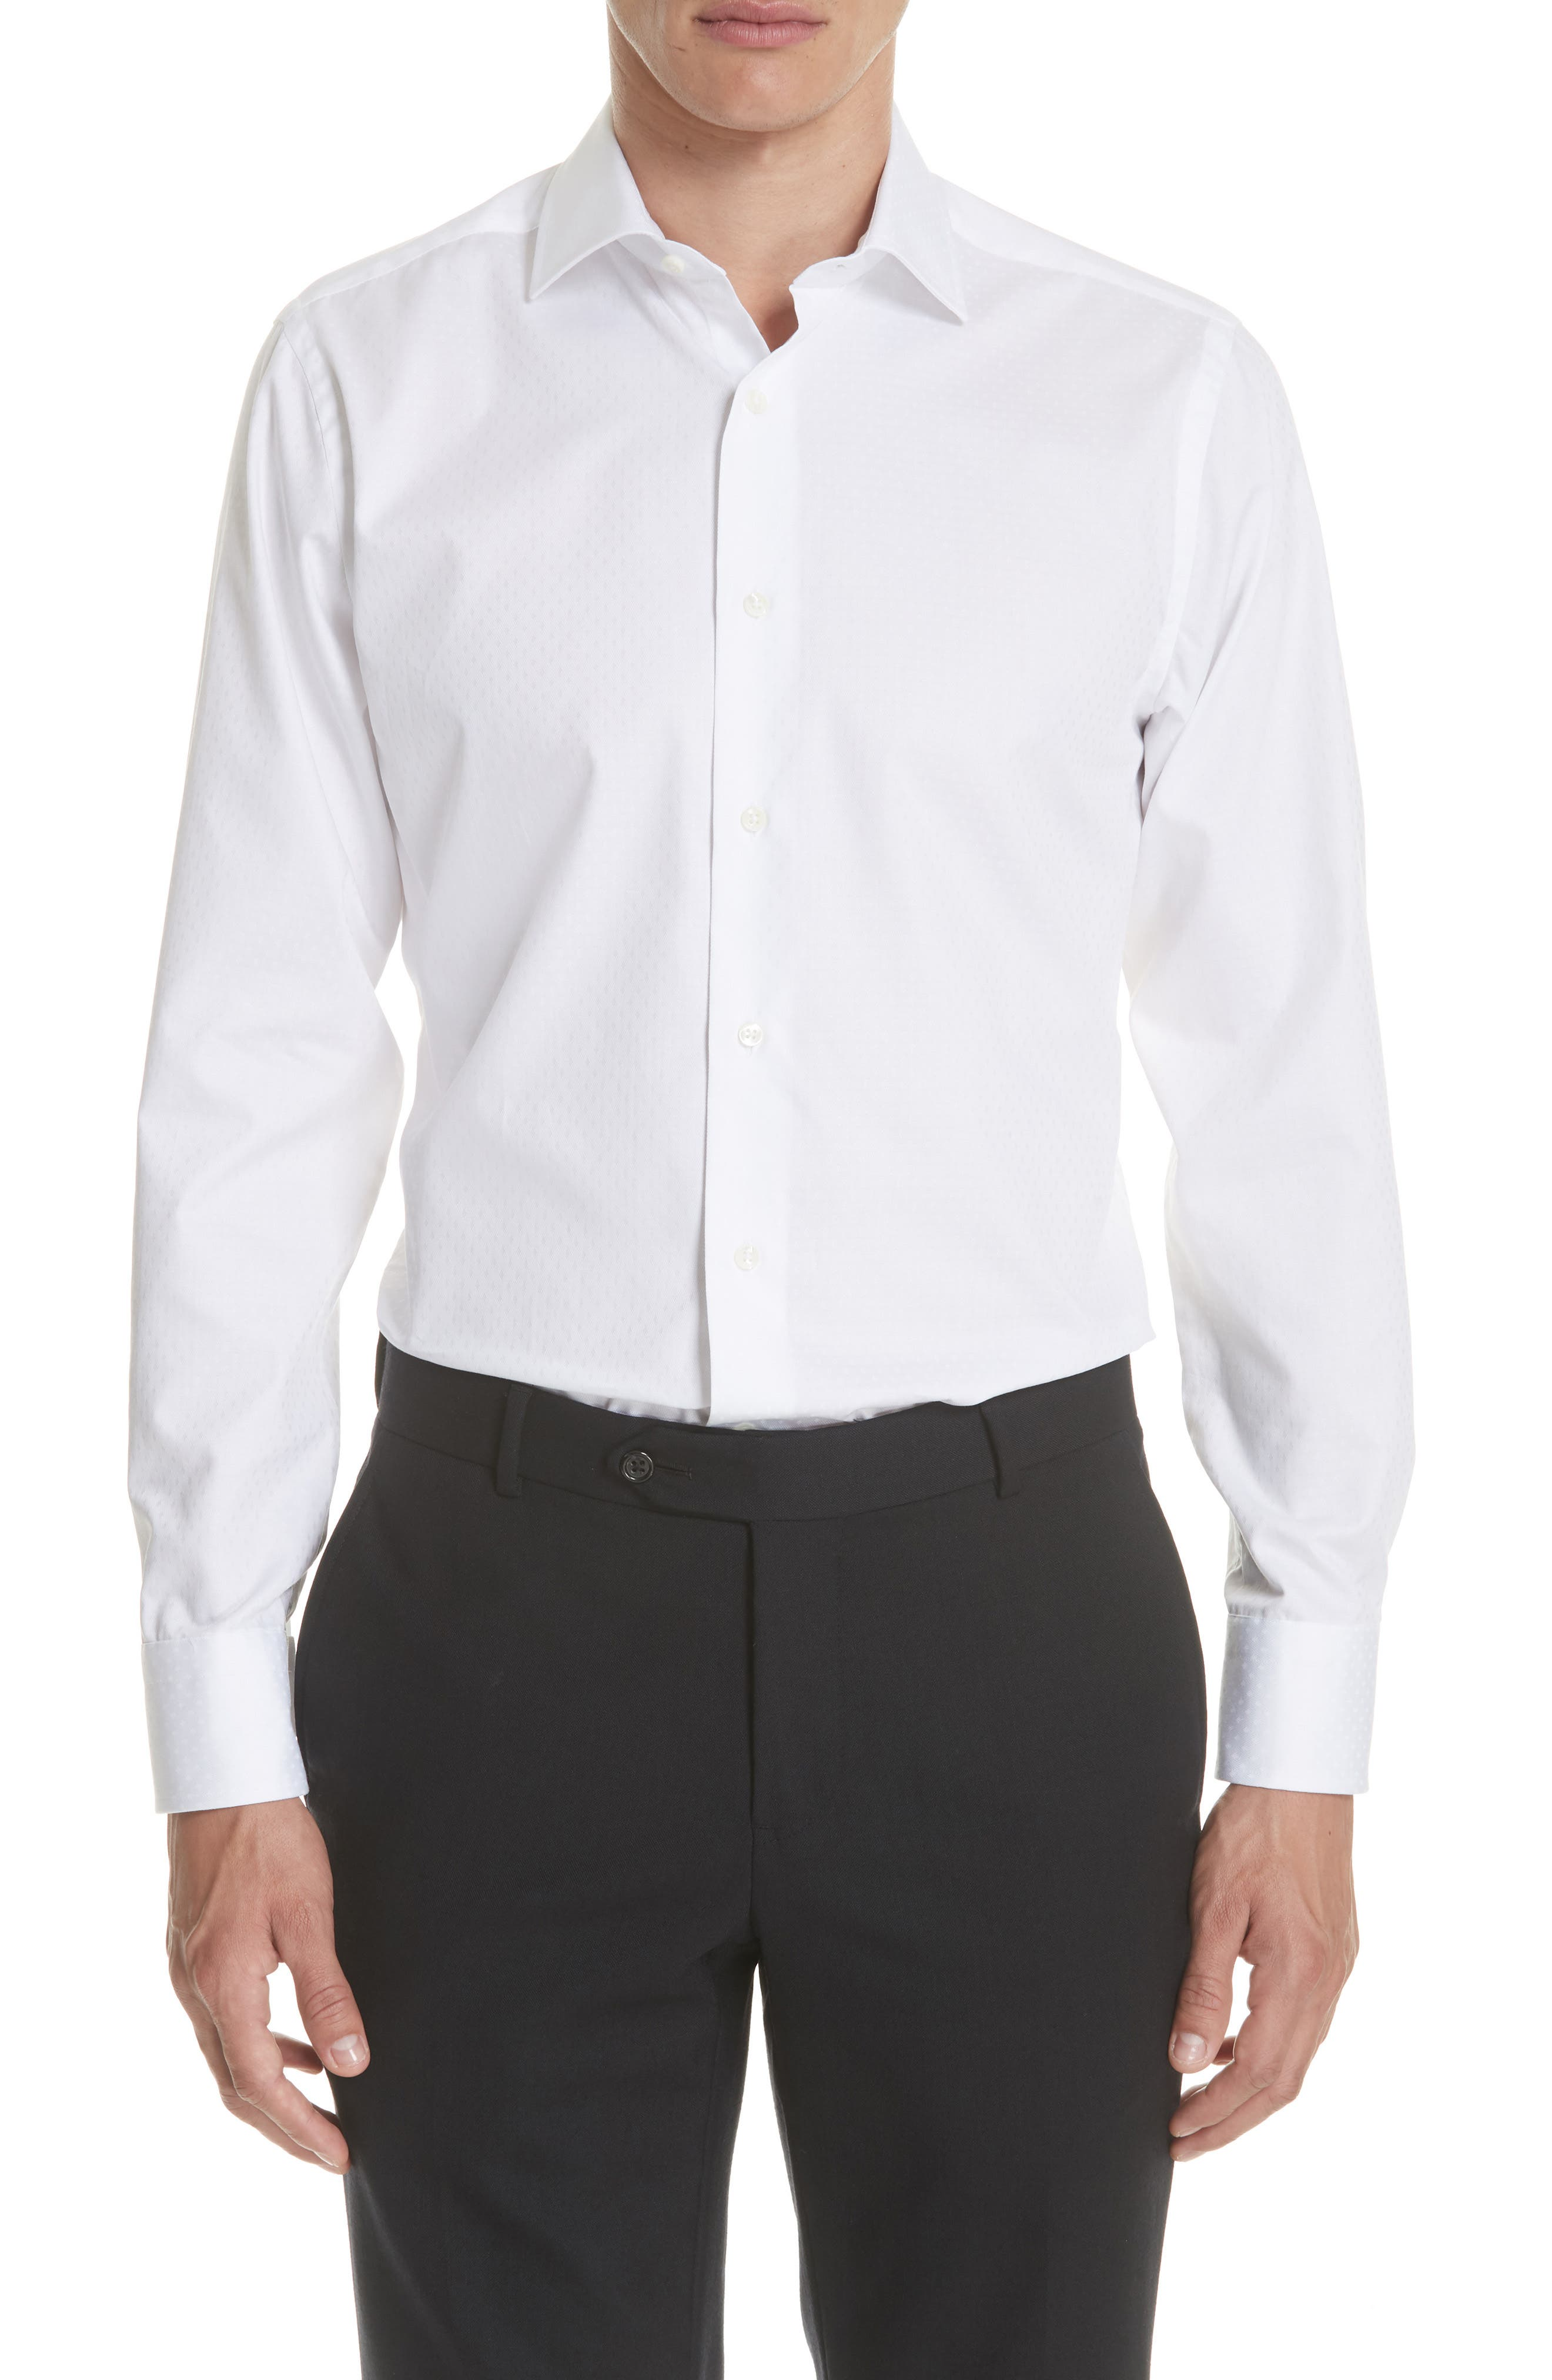 Regular Fit Solid Dress Shirt,                             Main thumbnail 1, color,                             100